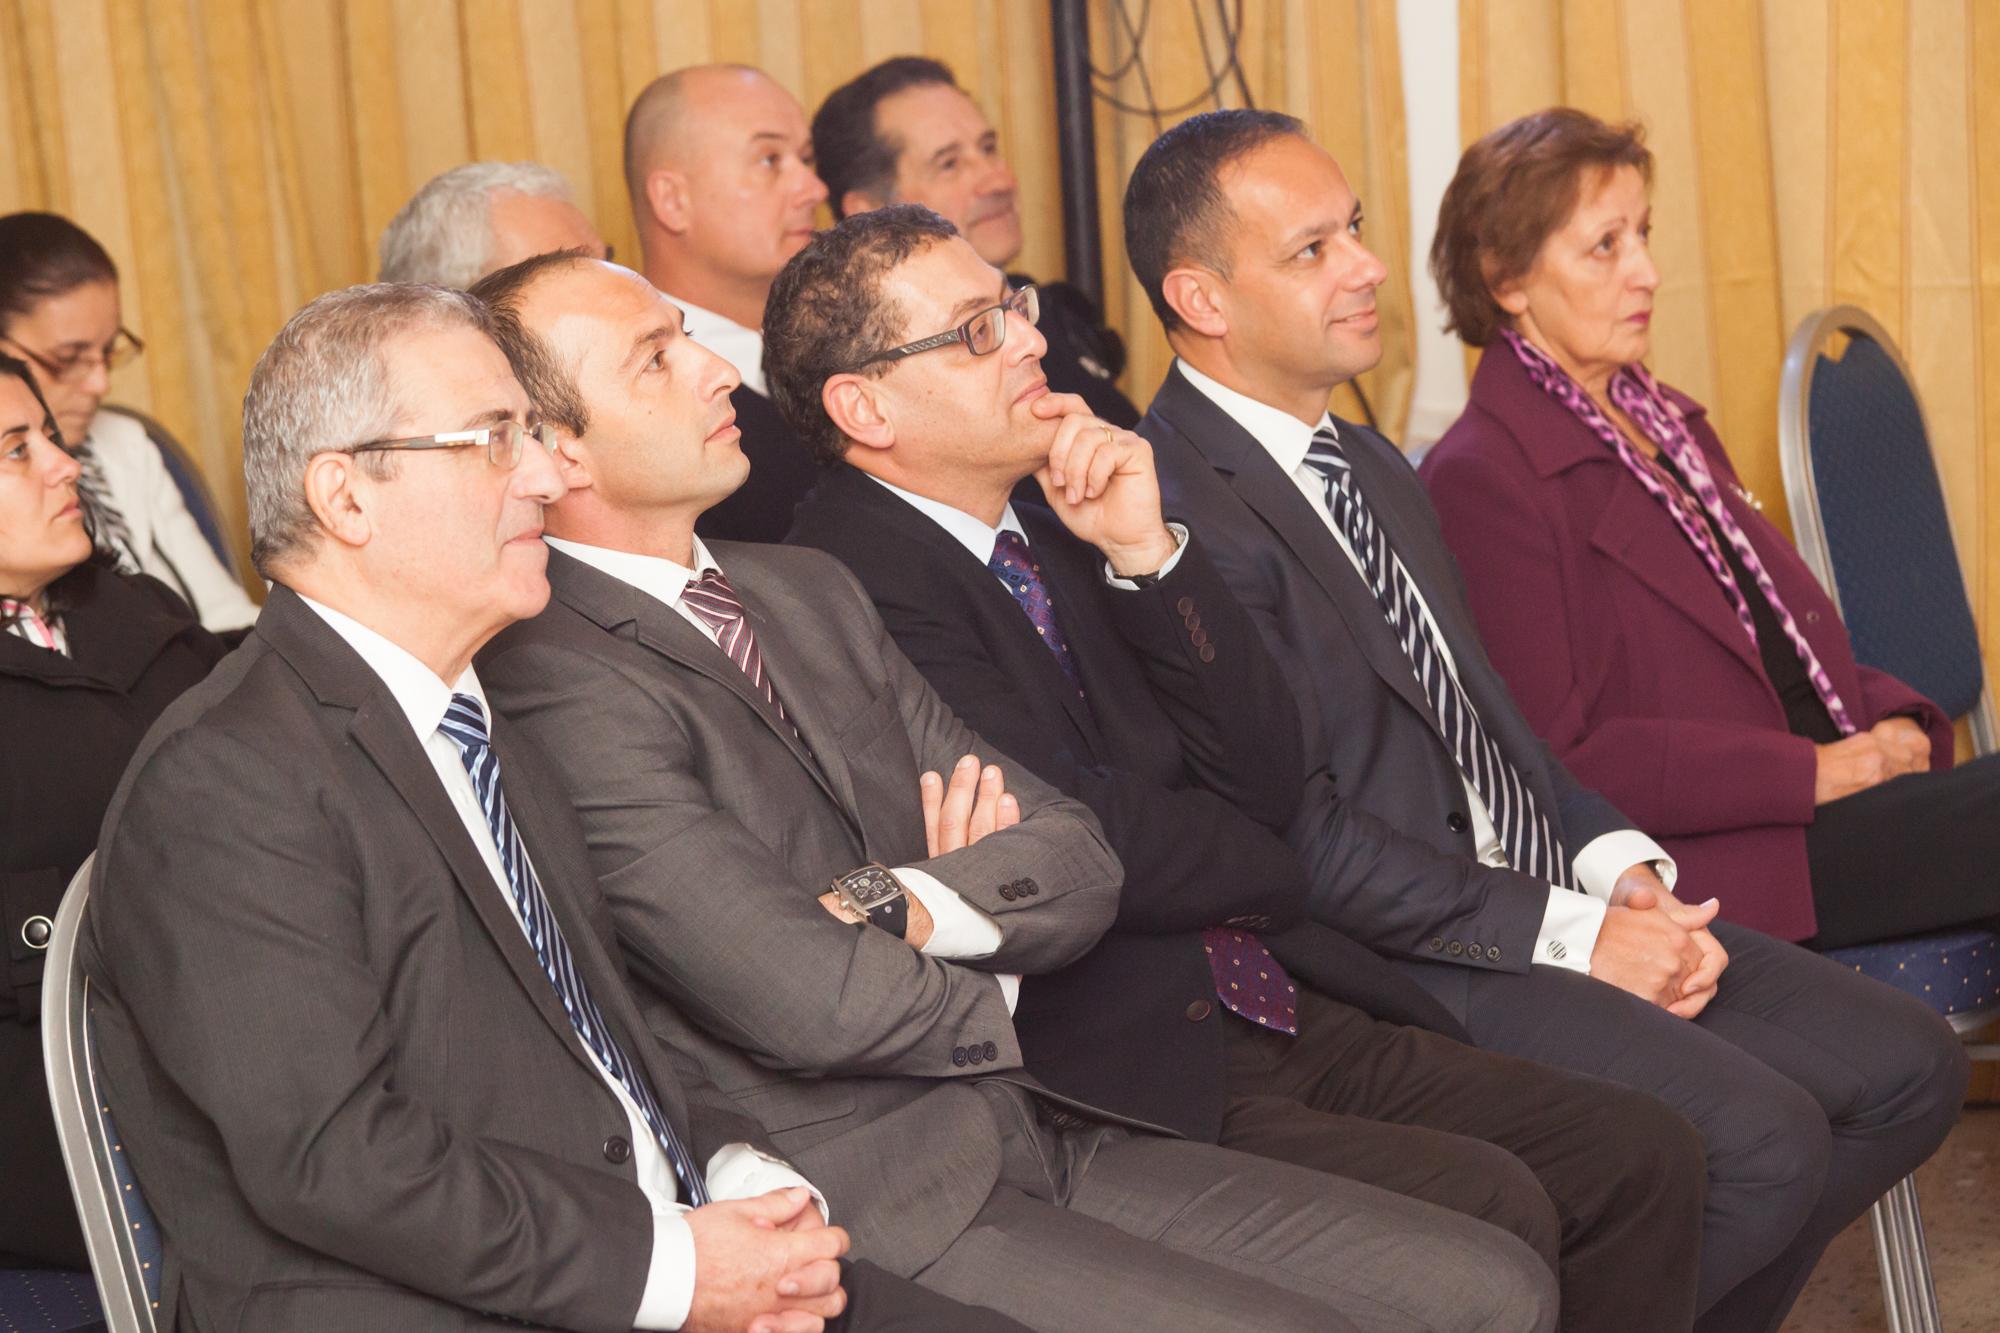 Enjoying the show. From left to right: Minister of Education Evarist Bartolo, Head of School Bernardo Riolo, Principal James Camilleri, Valletta 2018 Chairman Jason Micallef and School Council President Lilian Azzopardi